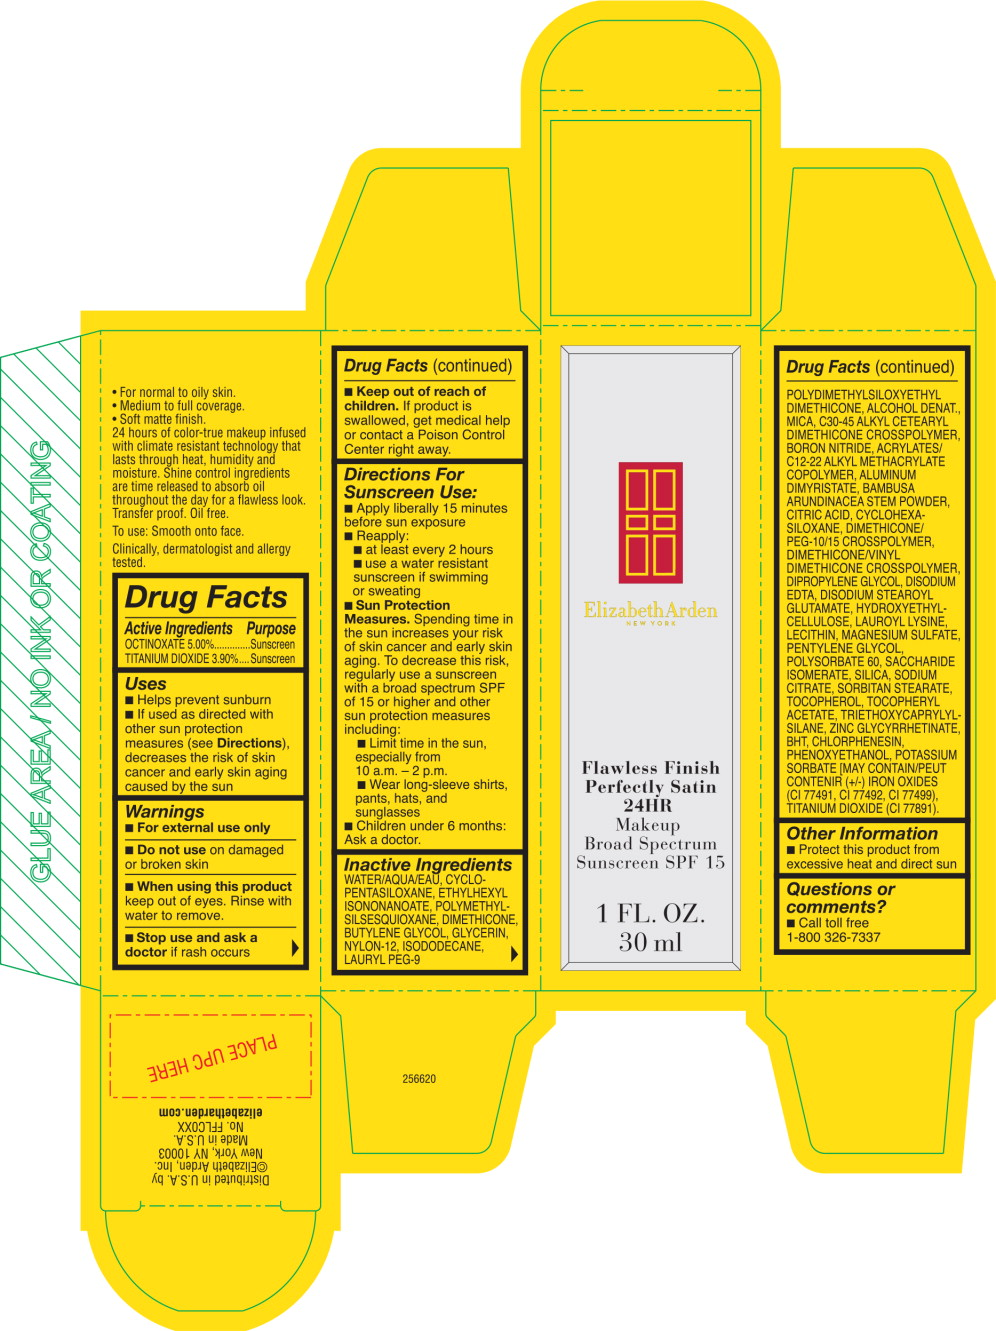 Flawless Finish Perfectly Satinb 24hr Makeup Shade Beige (Octinoxate, Titanium Dioxide) Cream [Elizabeth Arden, Inc]